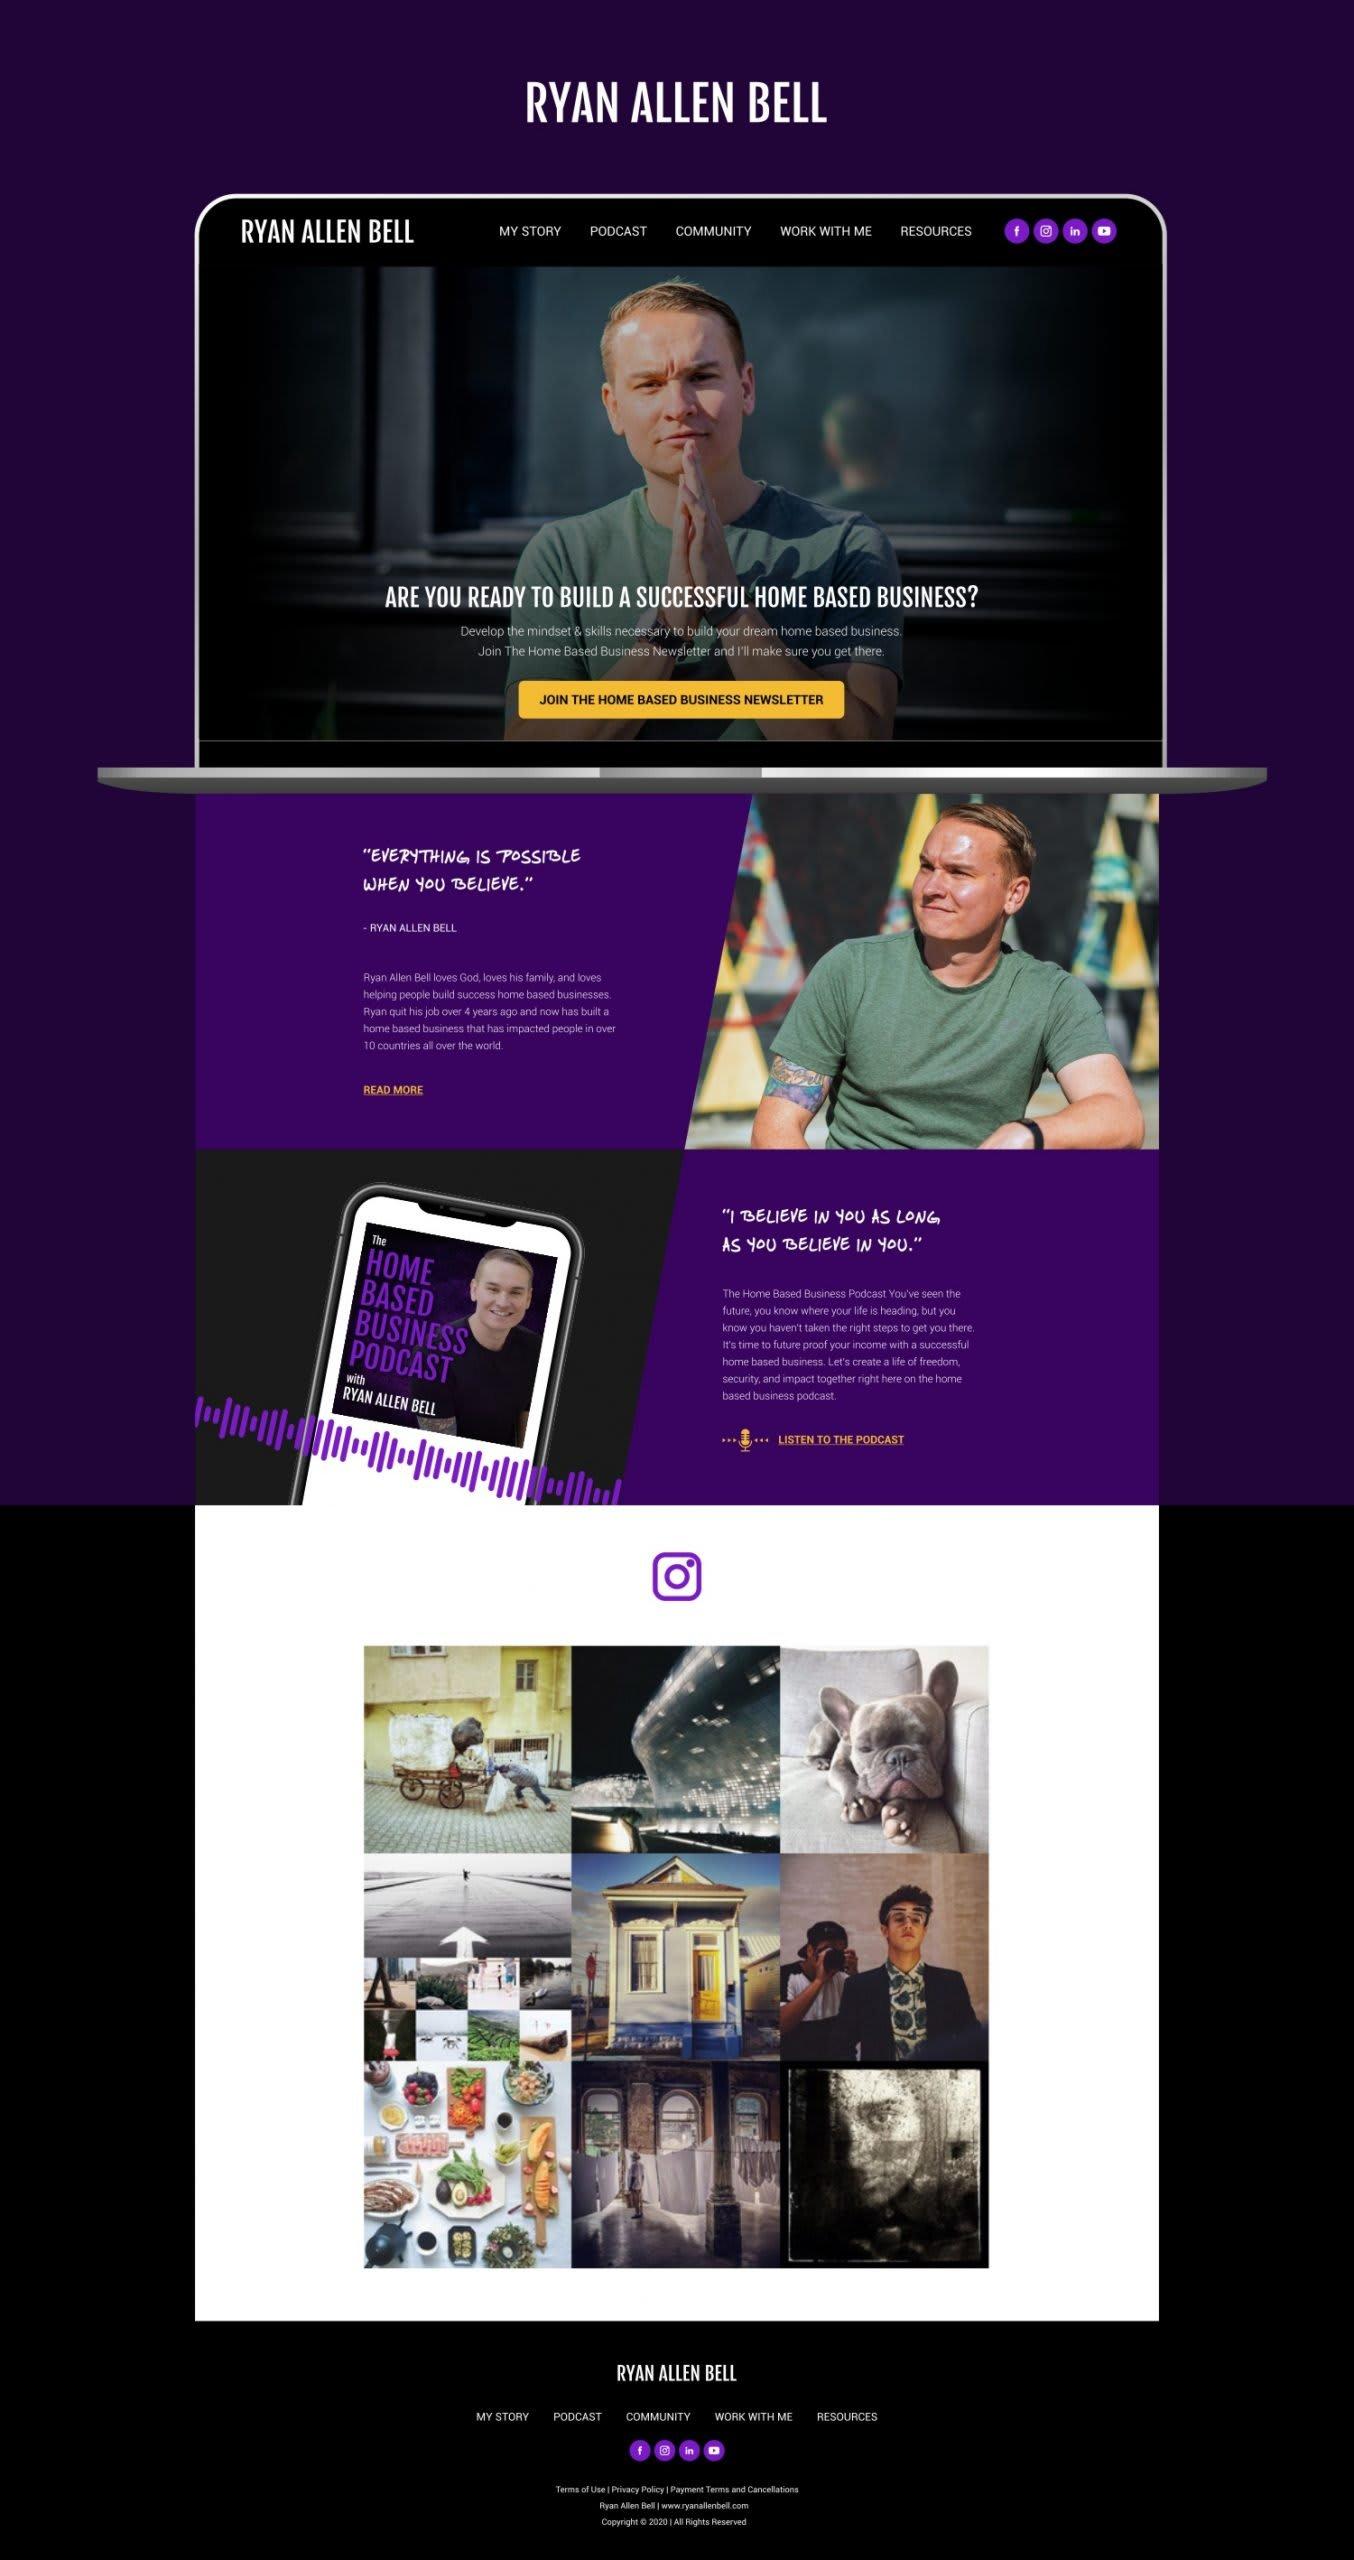 Ryan-Website-Preview-scaled.jpg